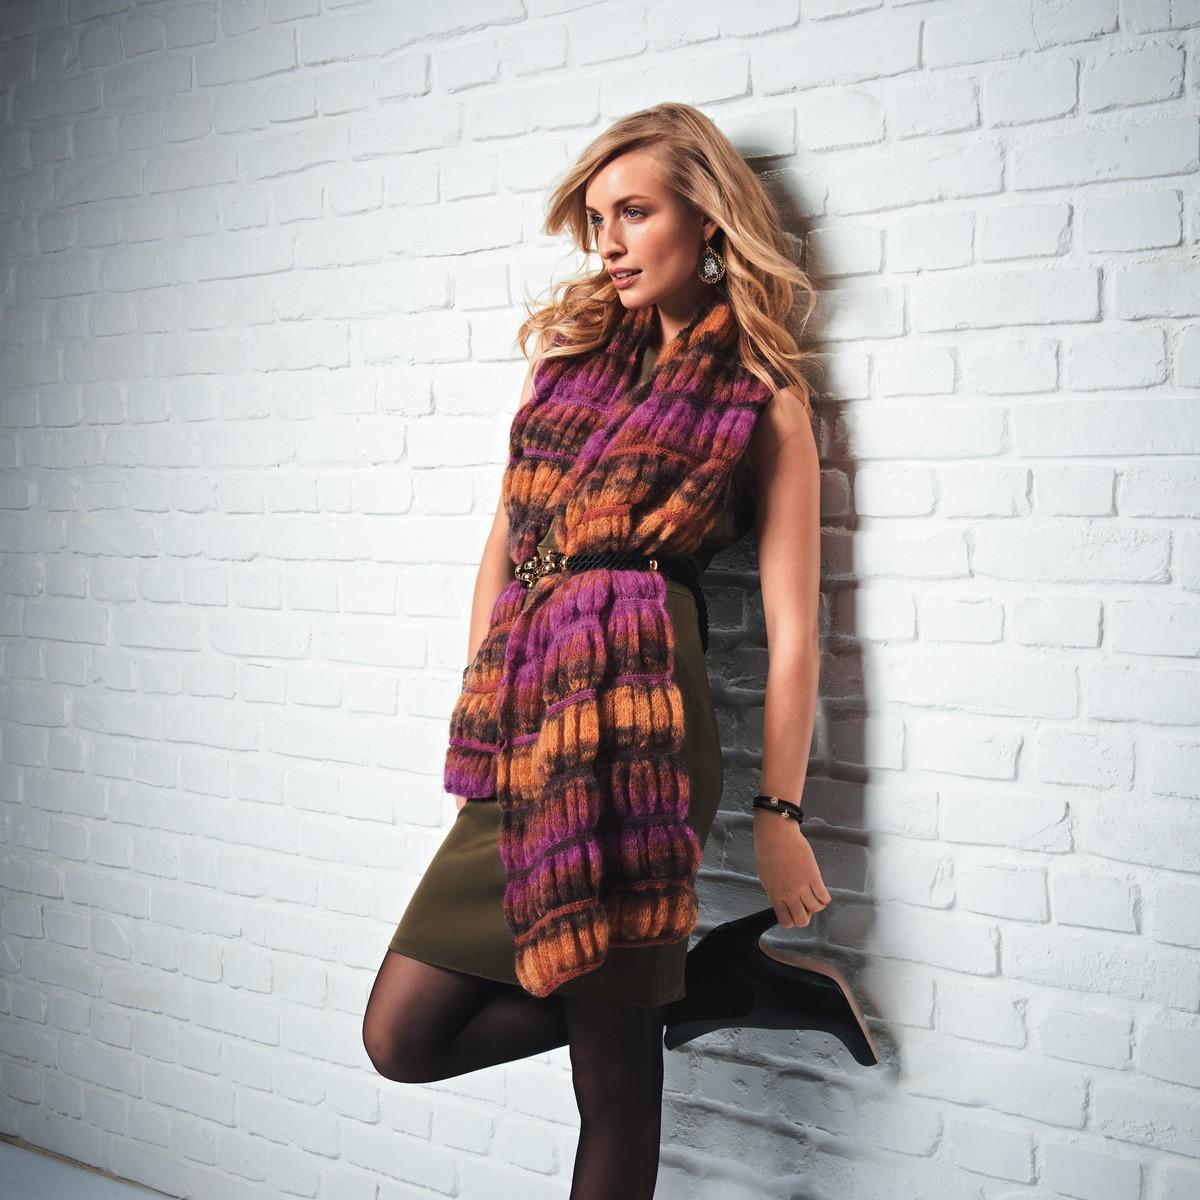 Lana Grossa SCHAL IM SMOKMUSTER Silkhair Print/Lace Merino Print/Degradé